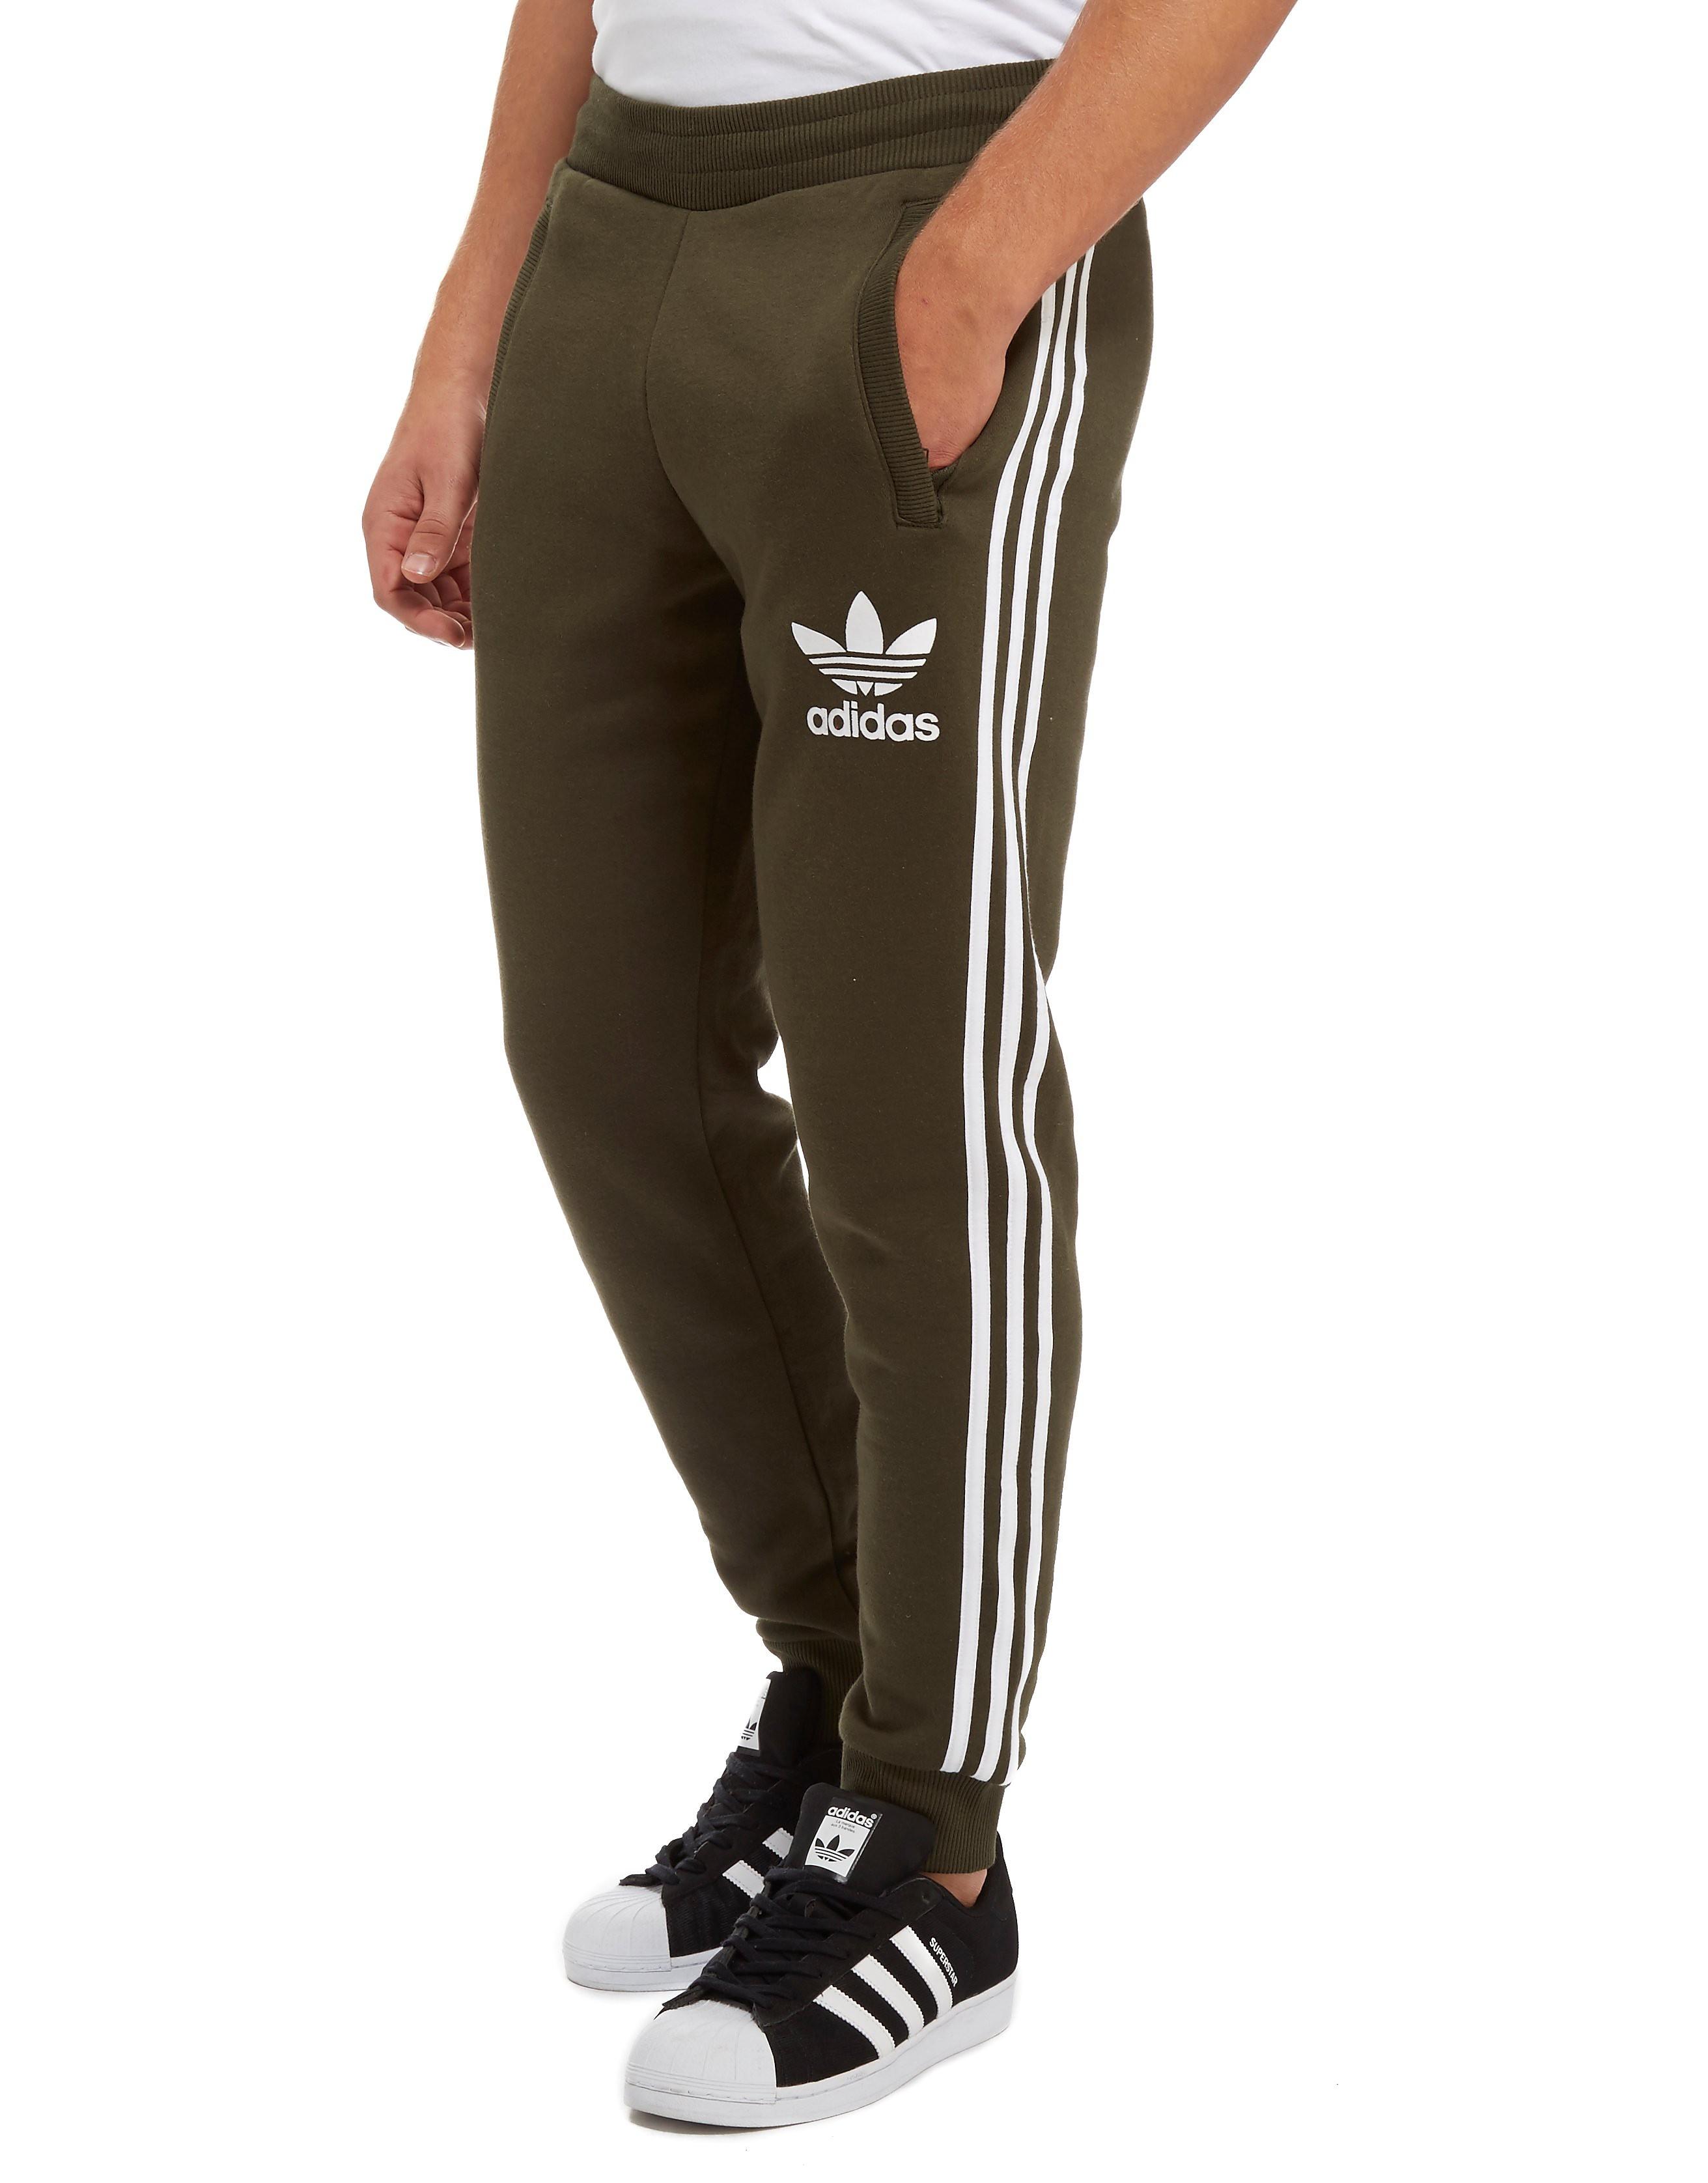 adidas Originals California Fleece Pants